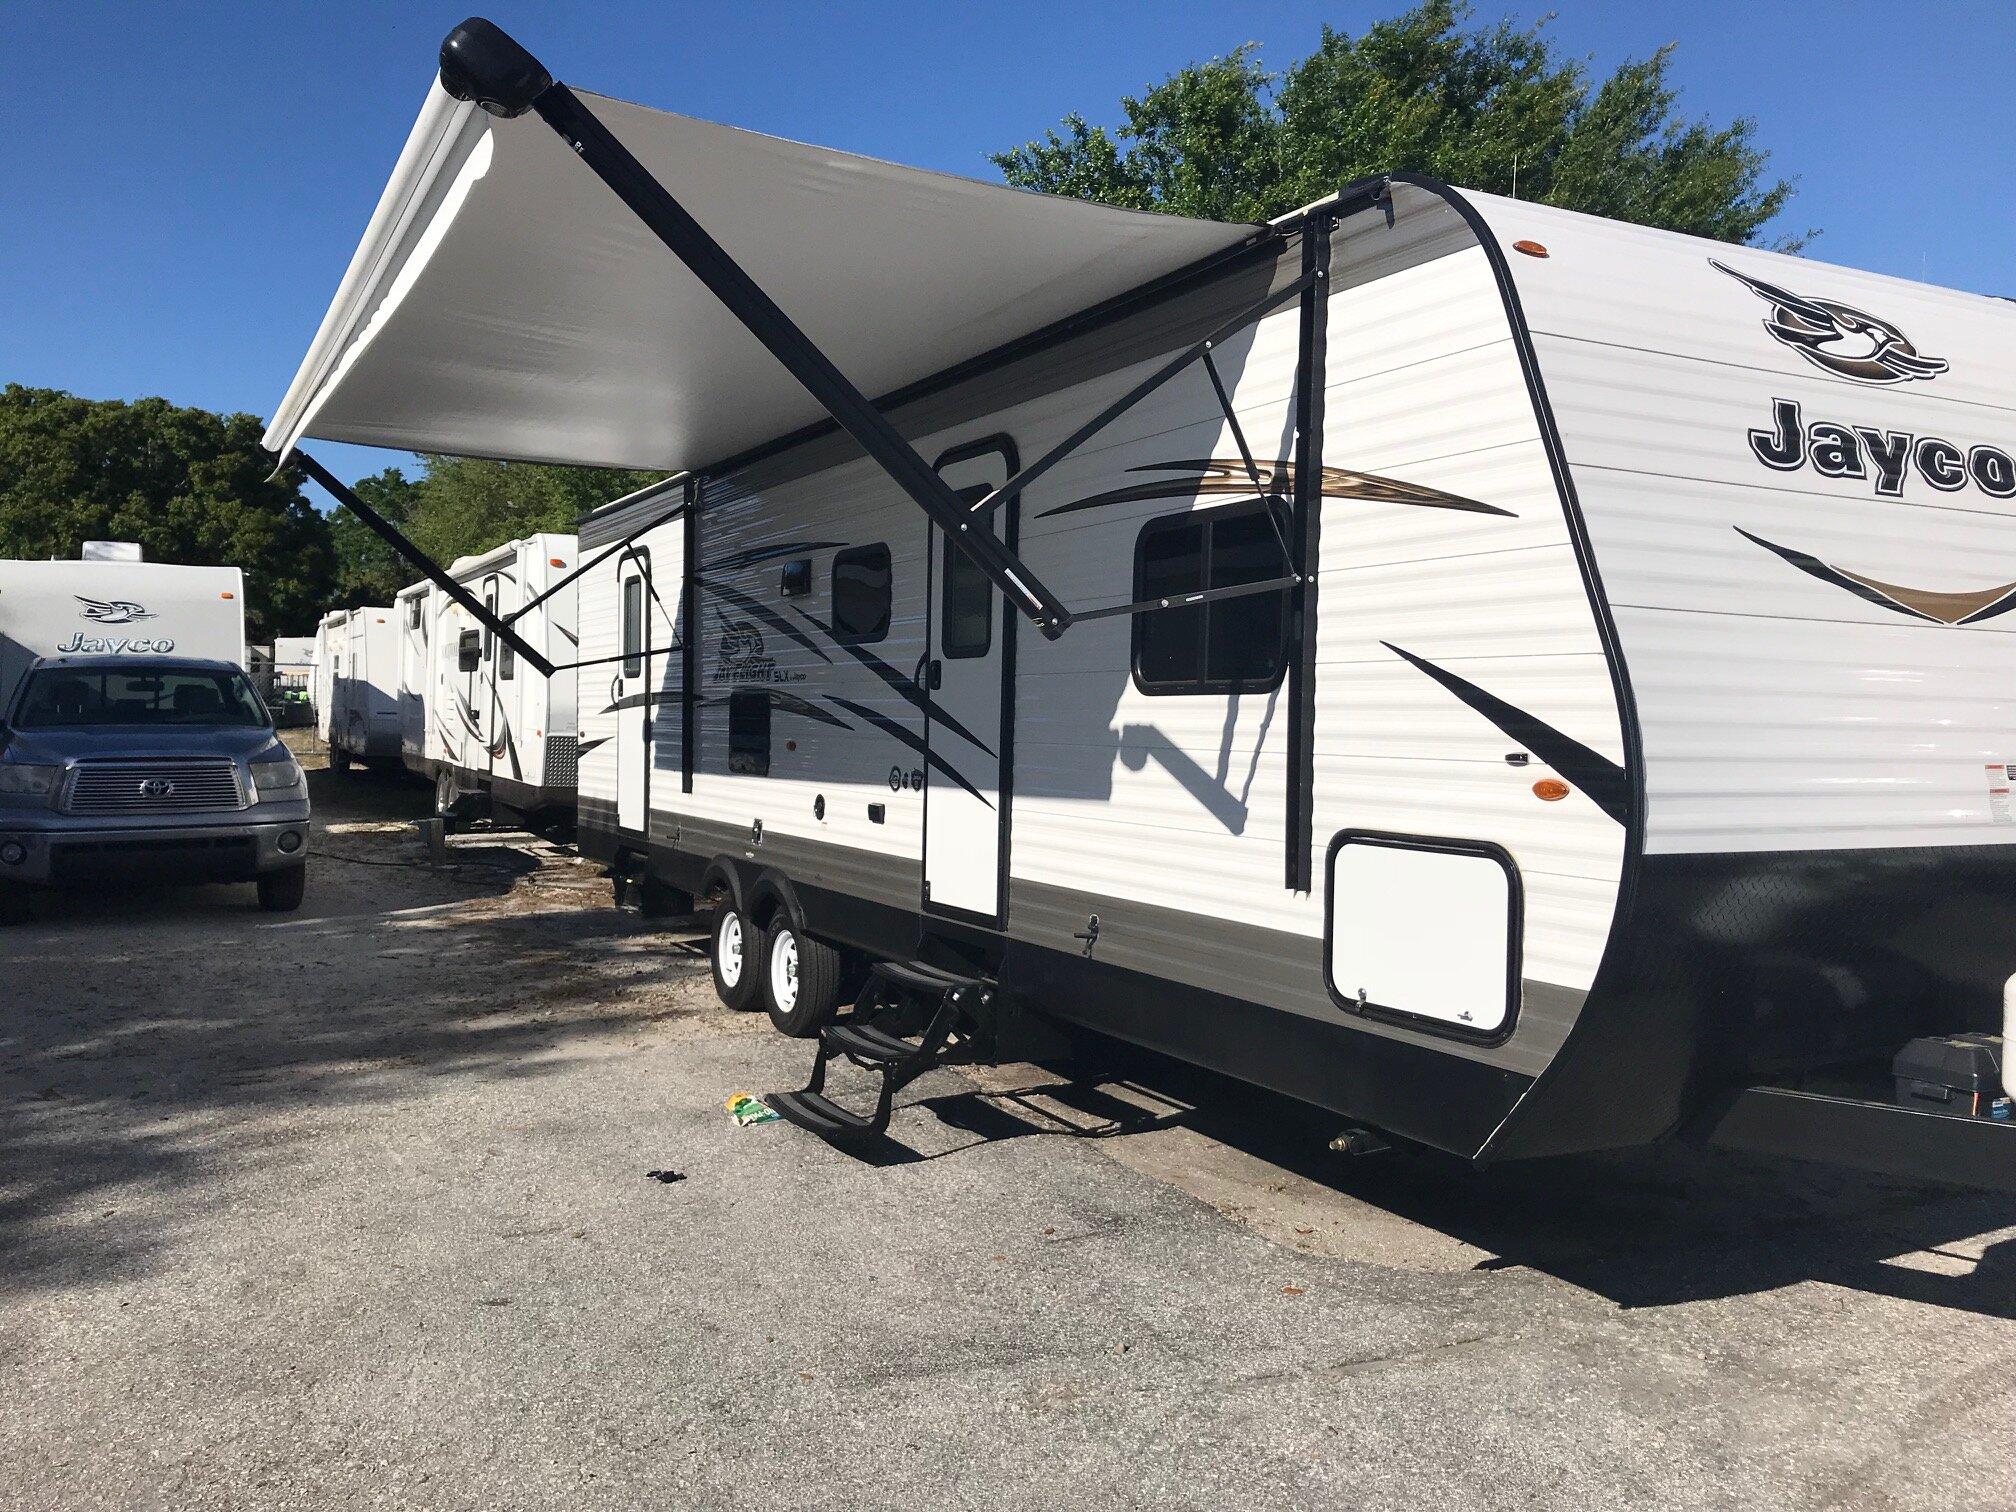 Meacham S Rv Only Official Fort Wilderness Rv Camper